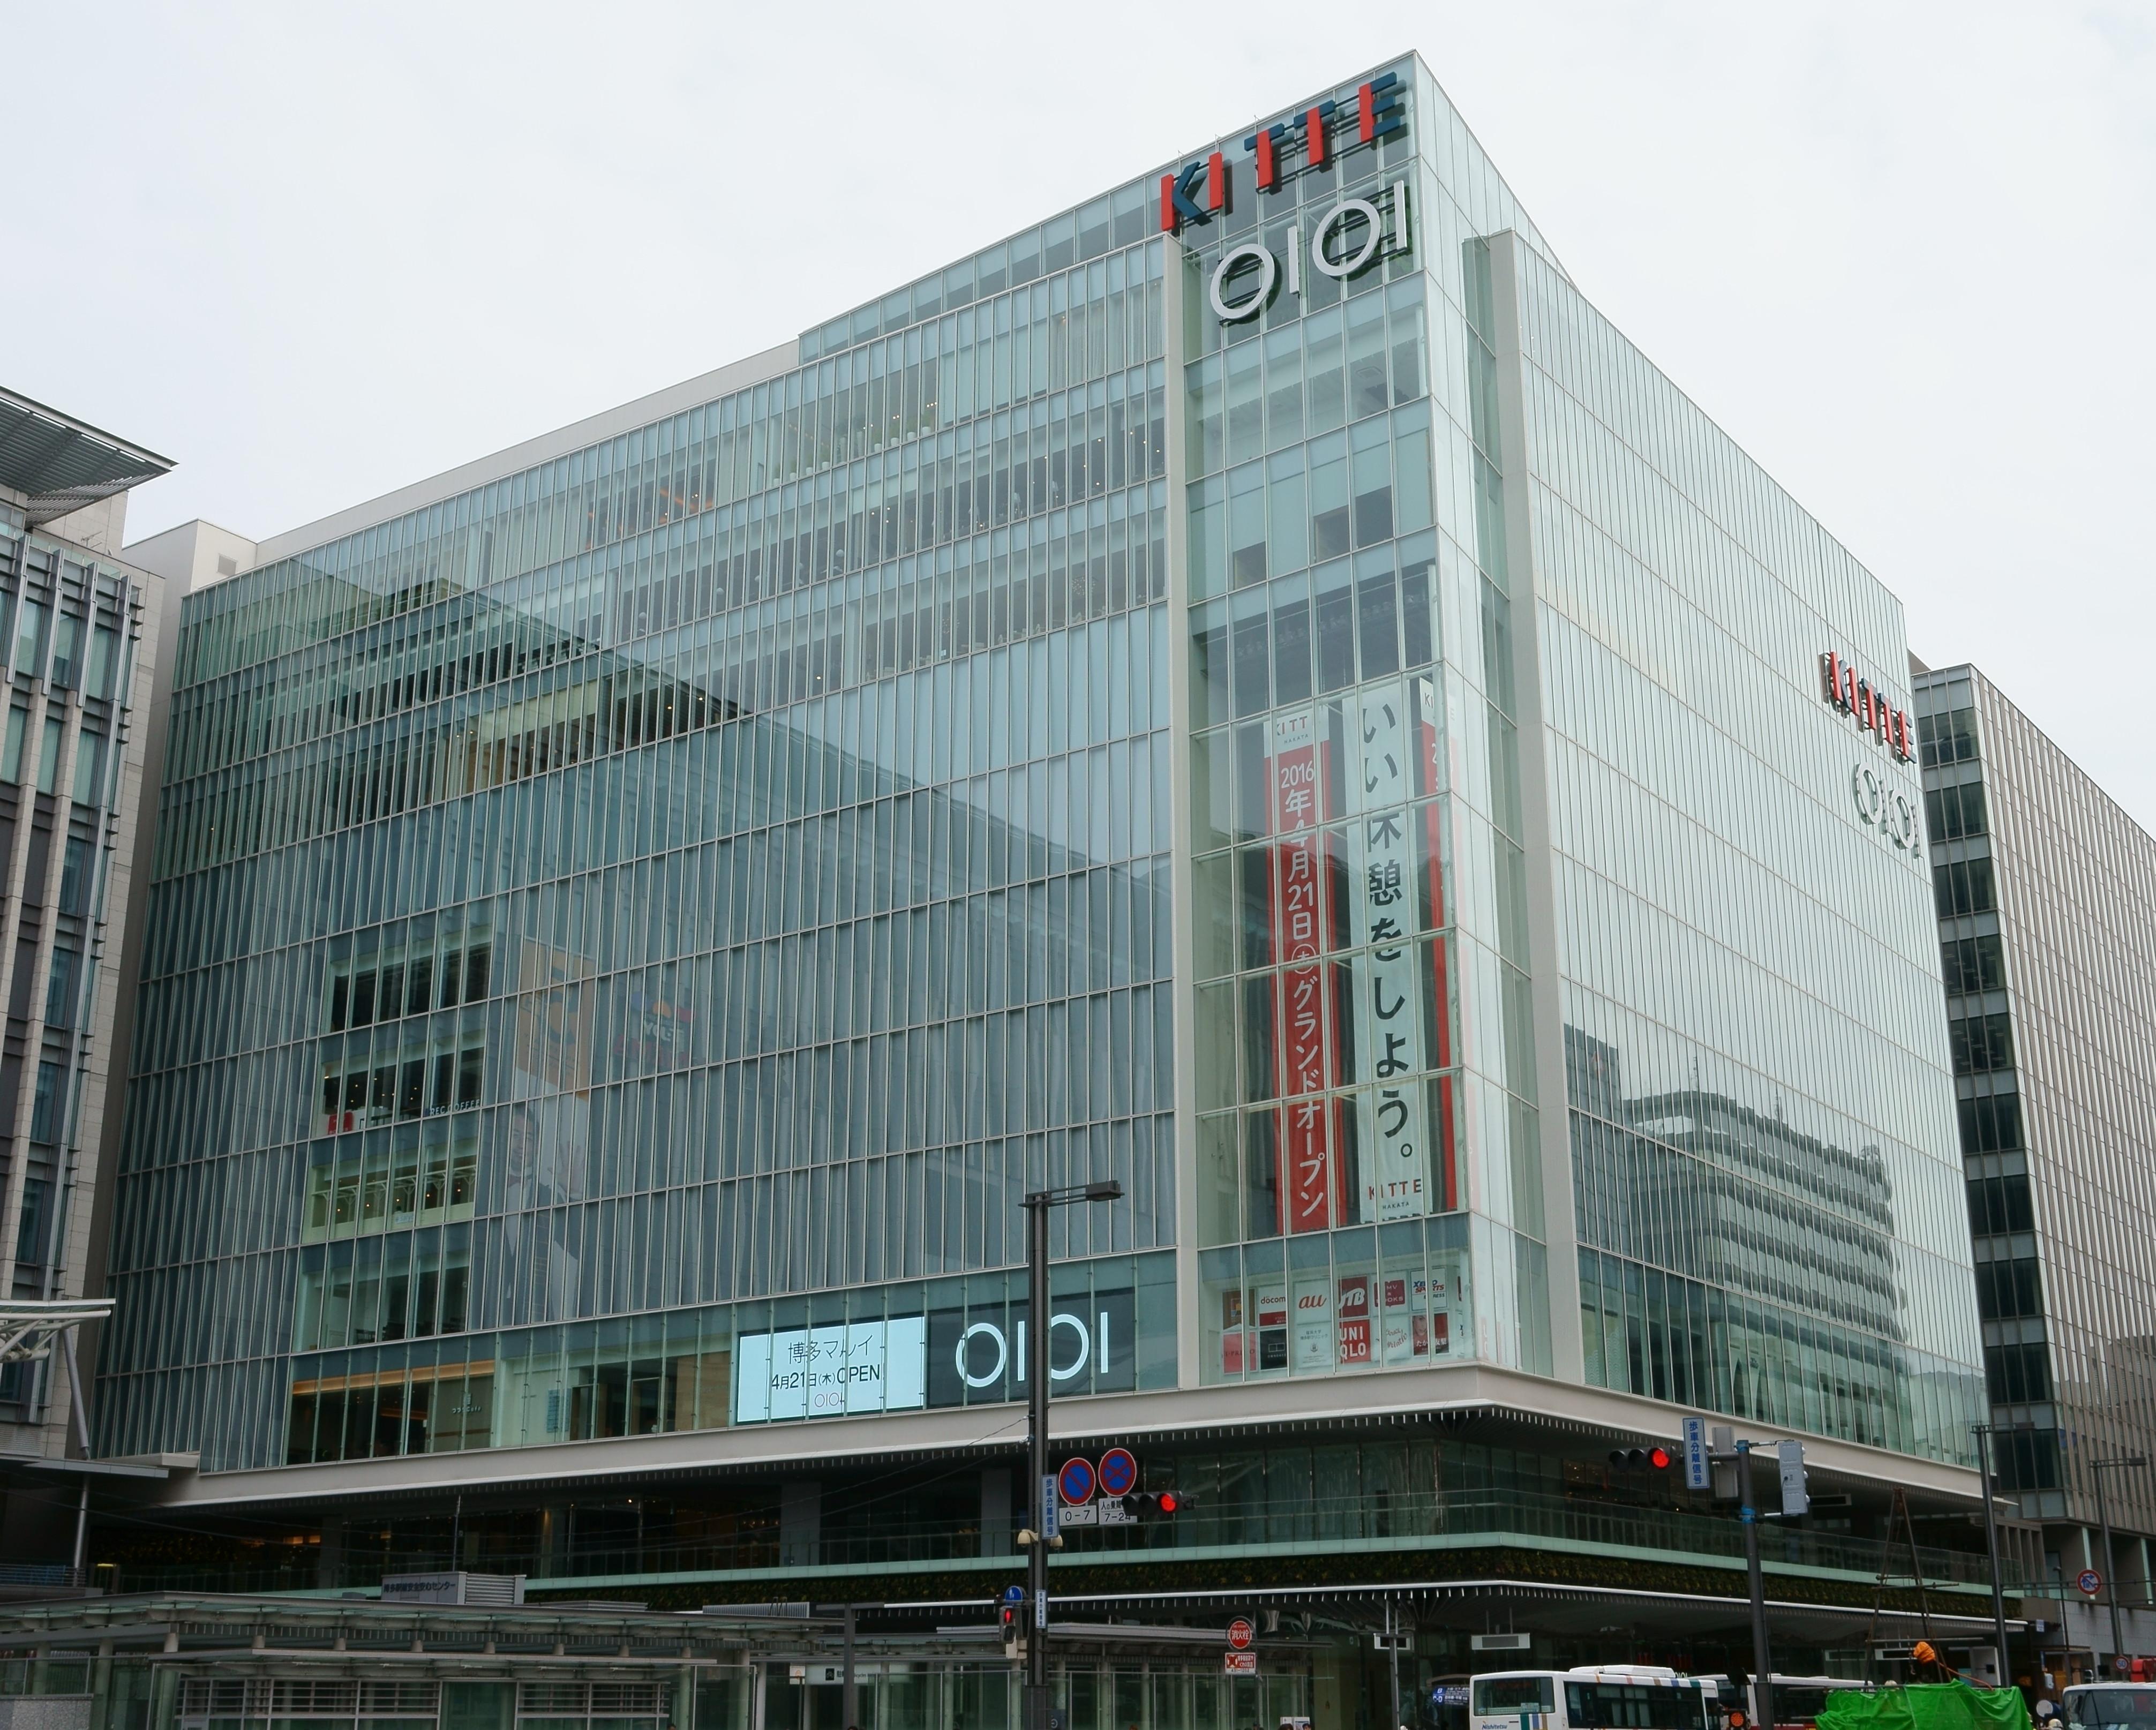 4d0cc0e3ec2fd 丸井 - Wikipedia